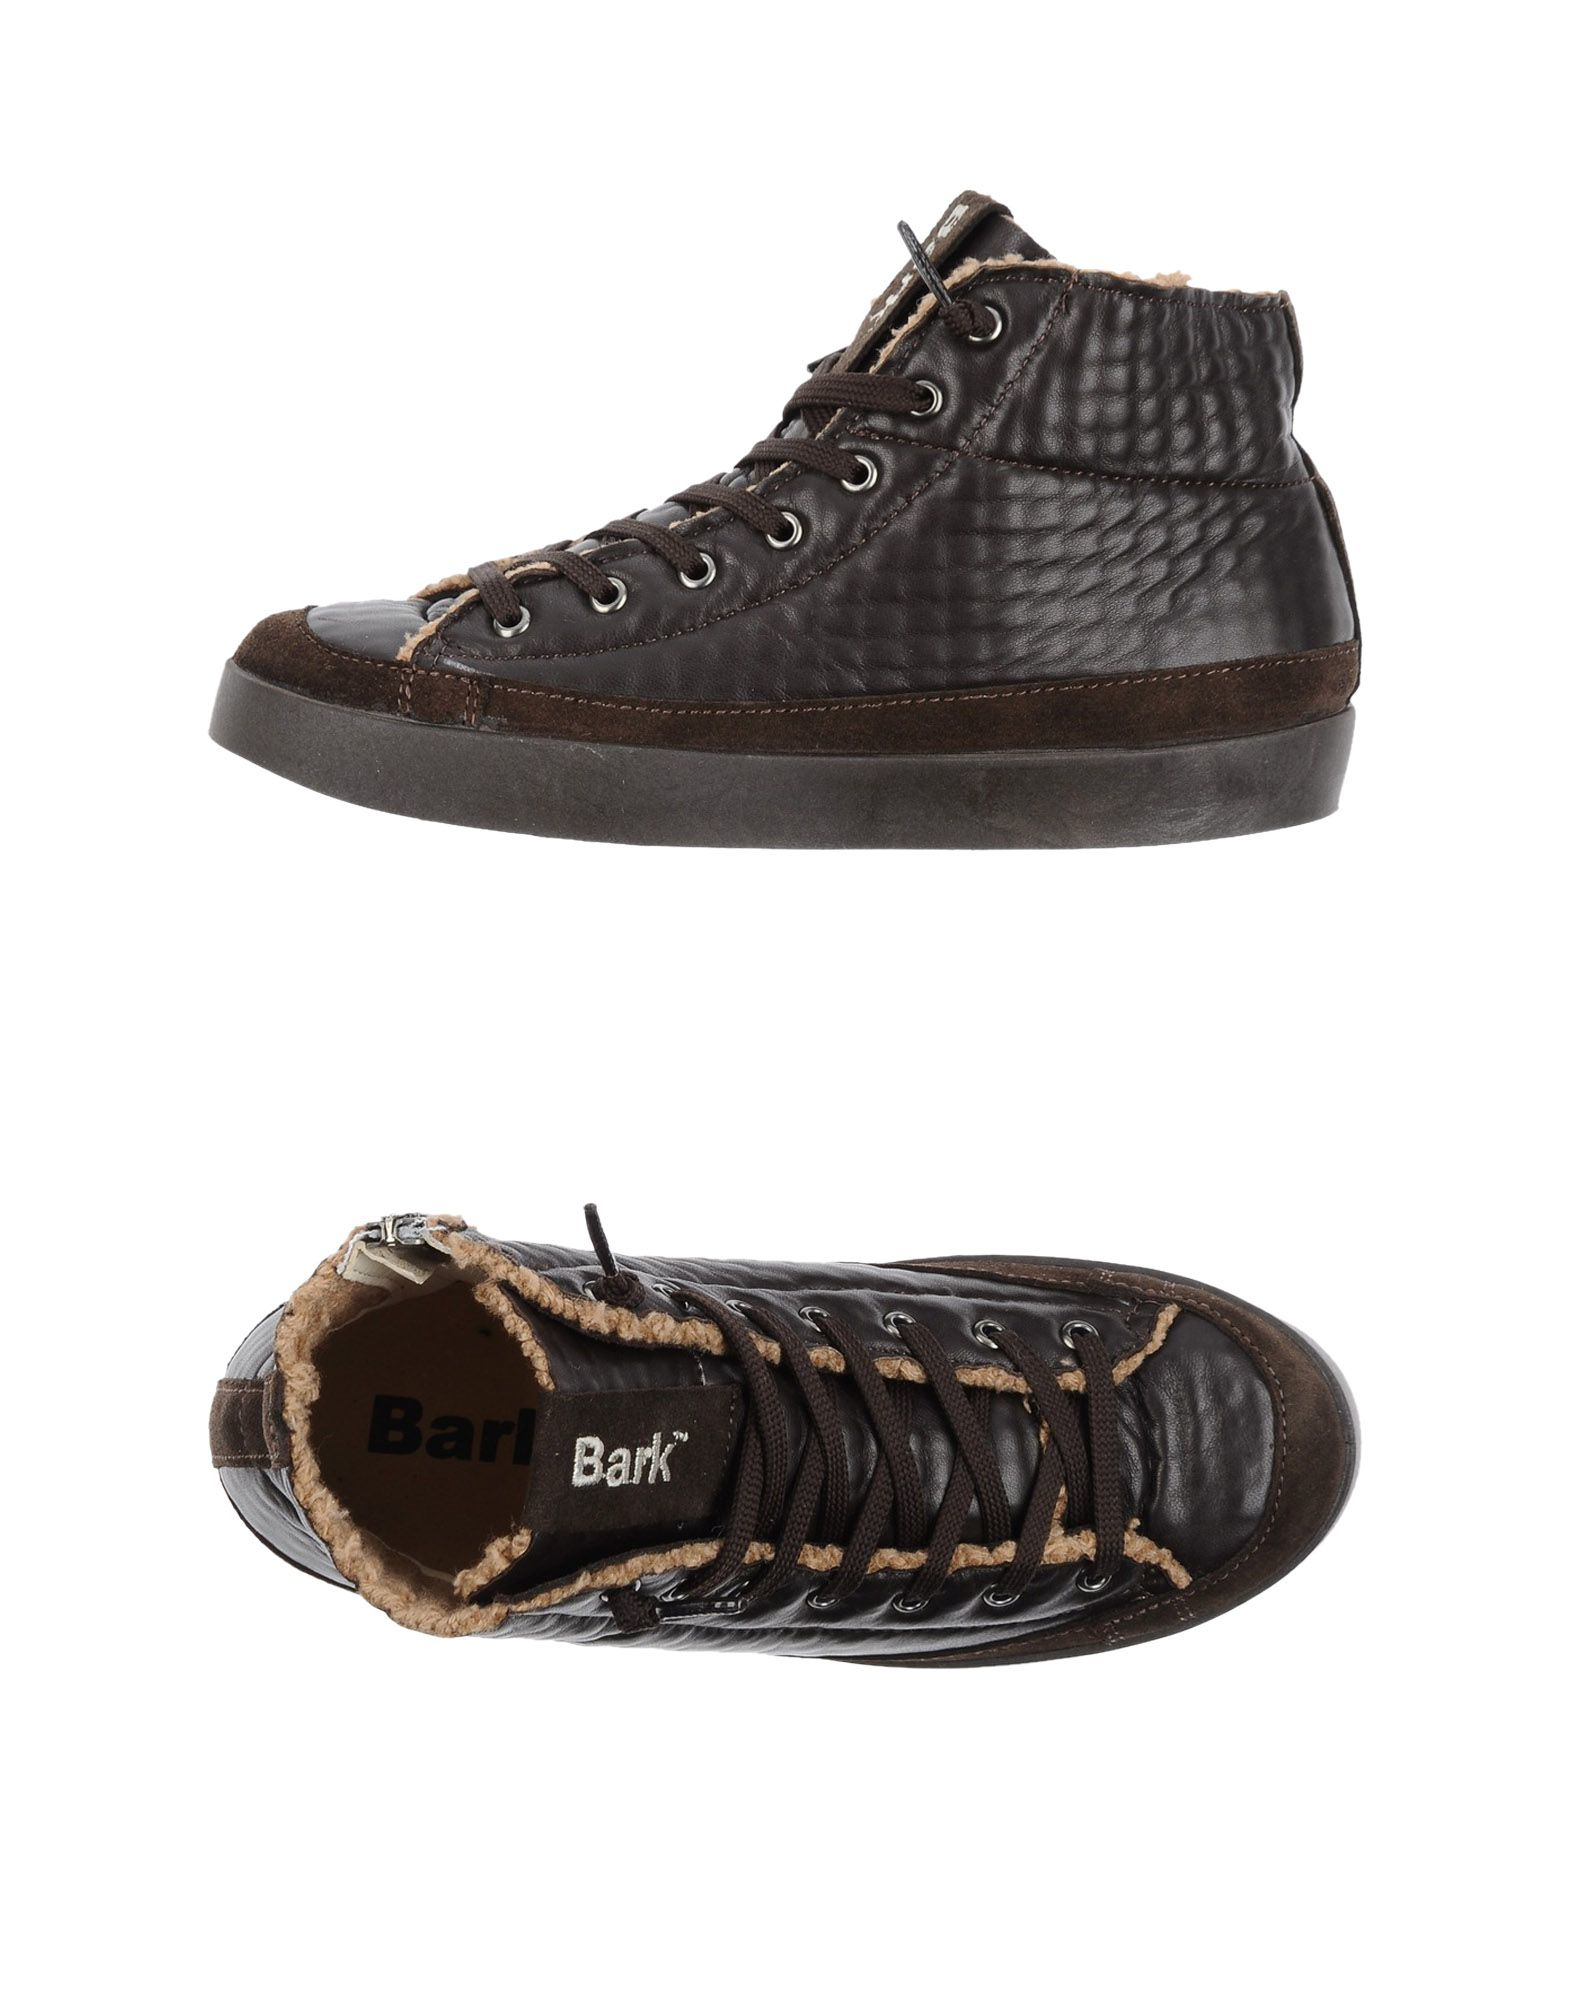 FOOTWEAR - High-tops & sneakers Bark 3gxEy1X4T